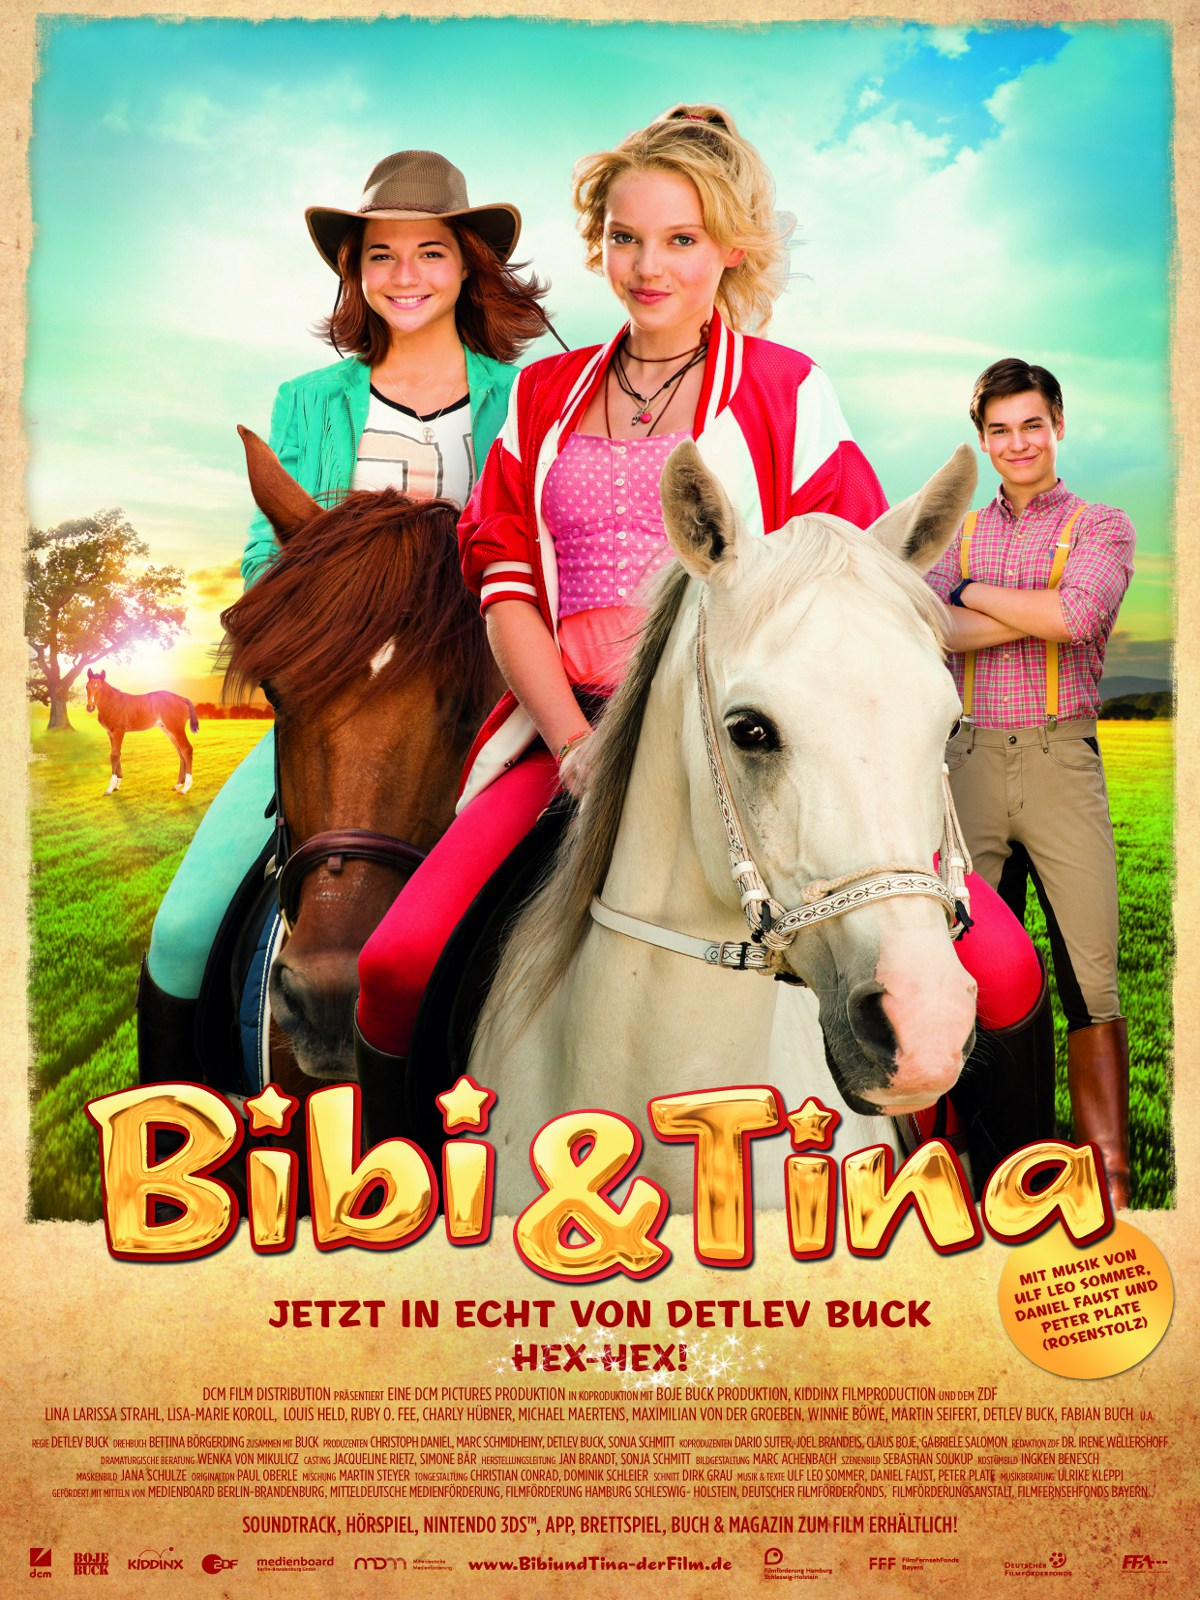 Poster zum Bibi & Tina - Der Film - Bild 1 - FILMSTARTS.de